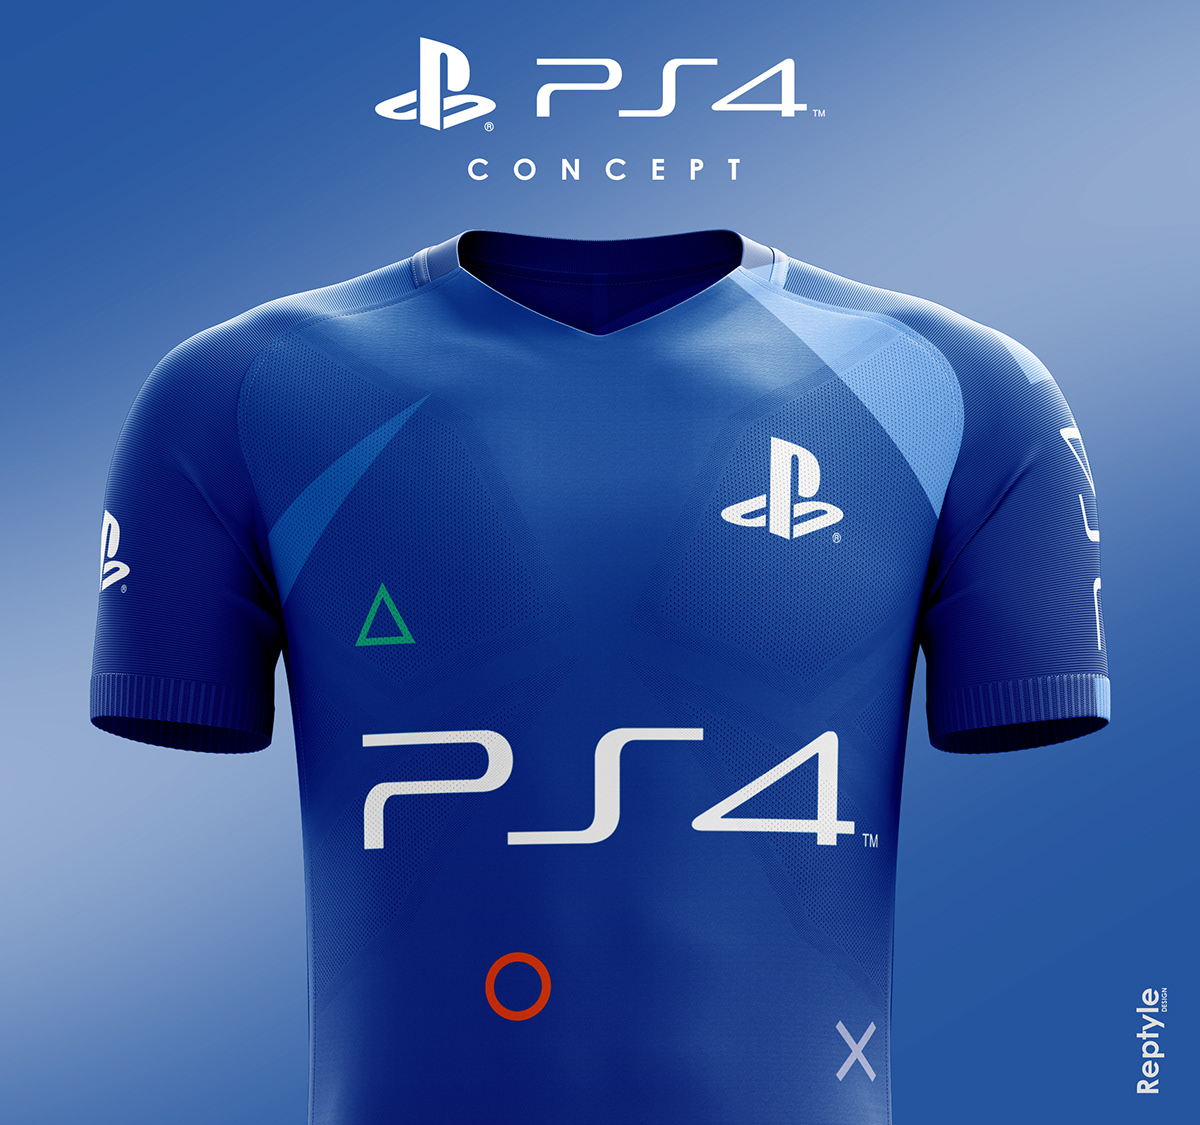 Playstation 4 soccer kit concept on Behance d8323f5fd